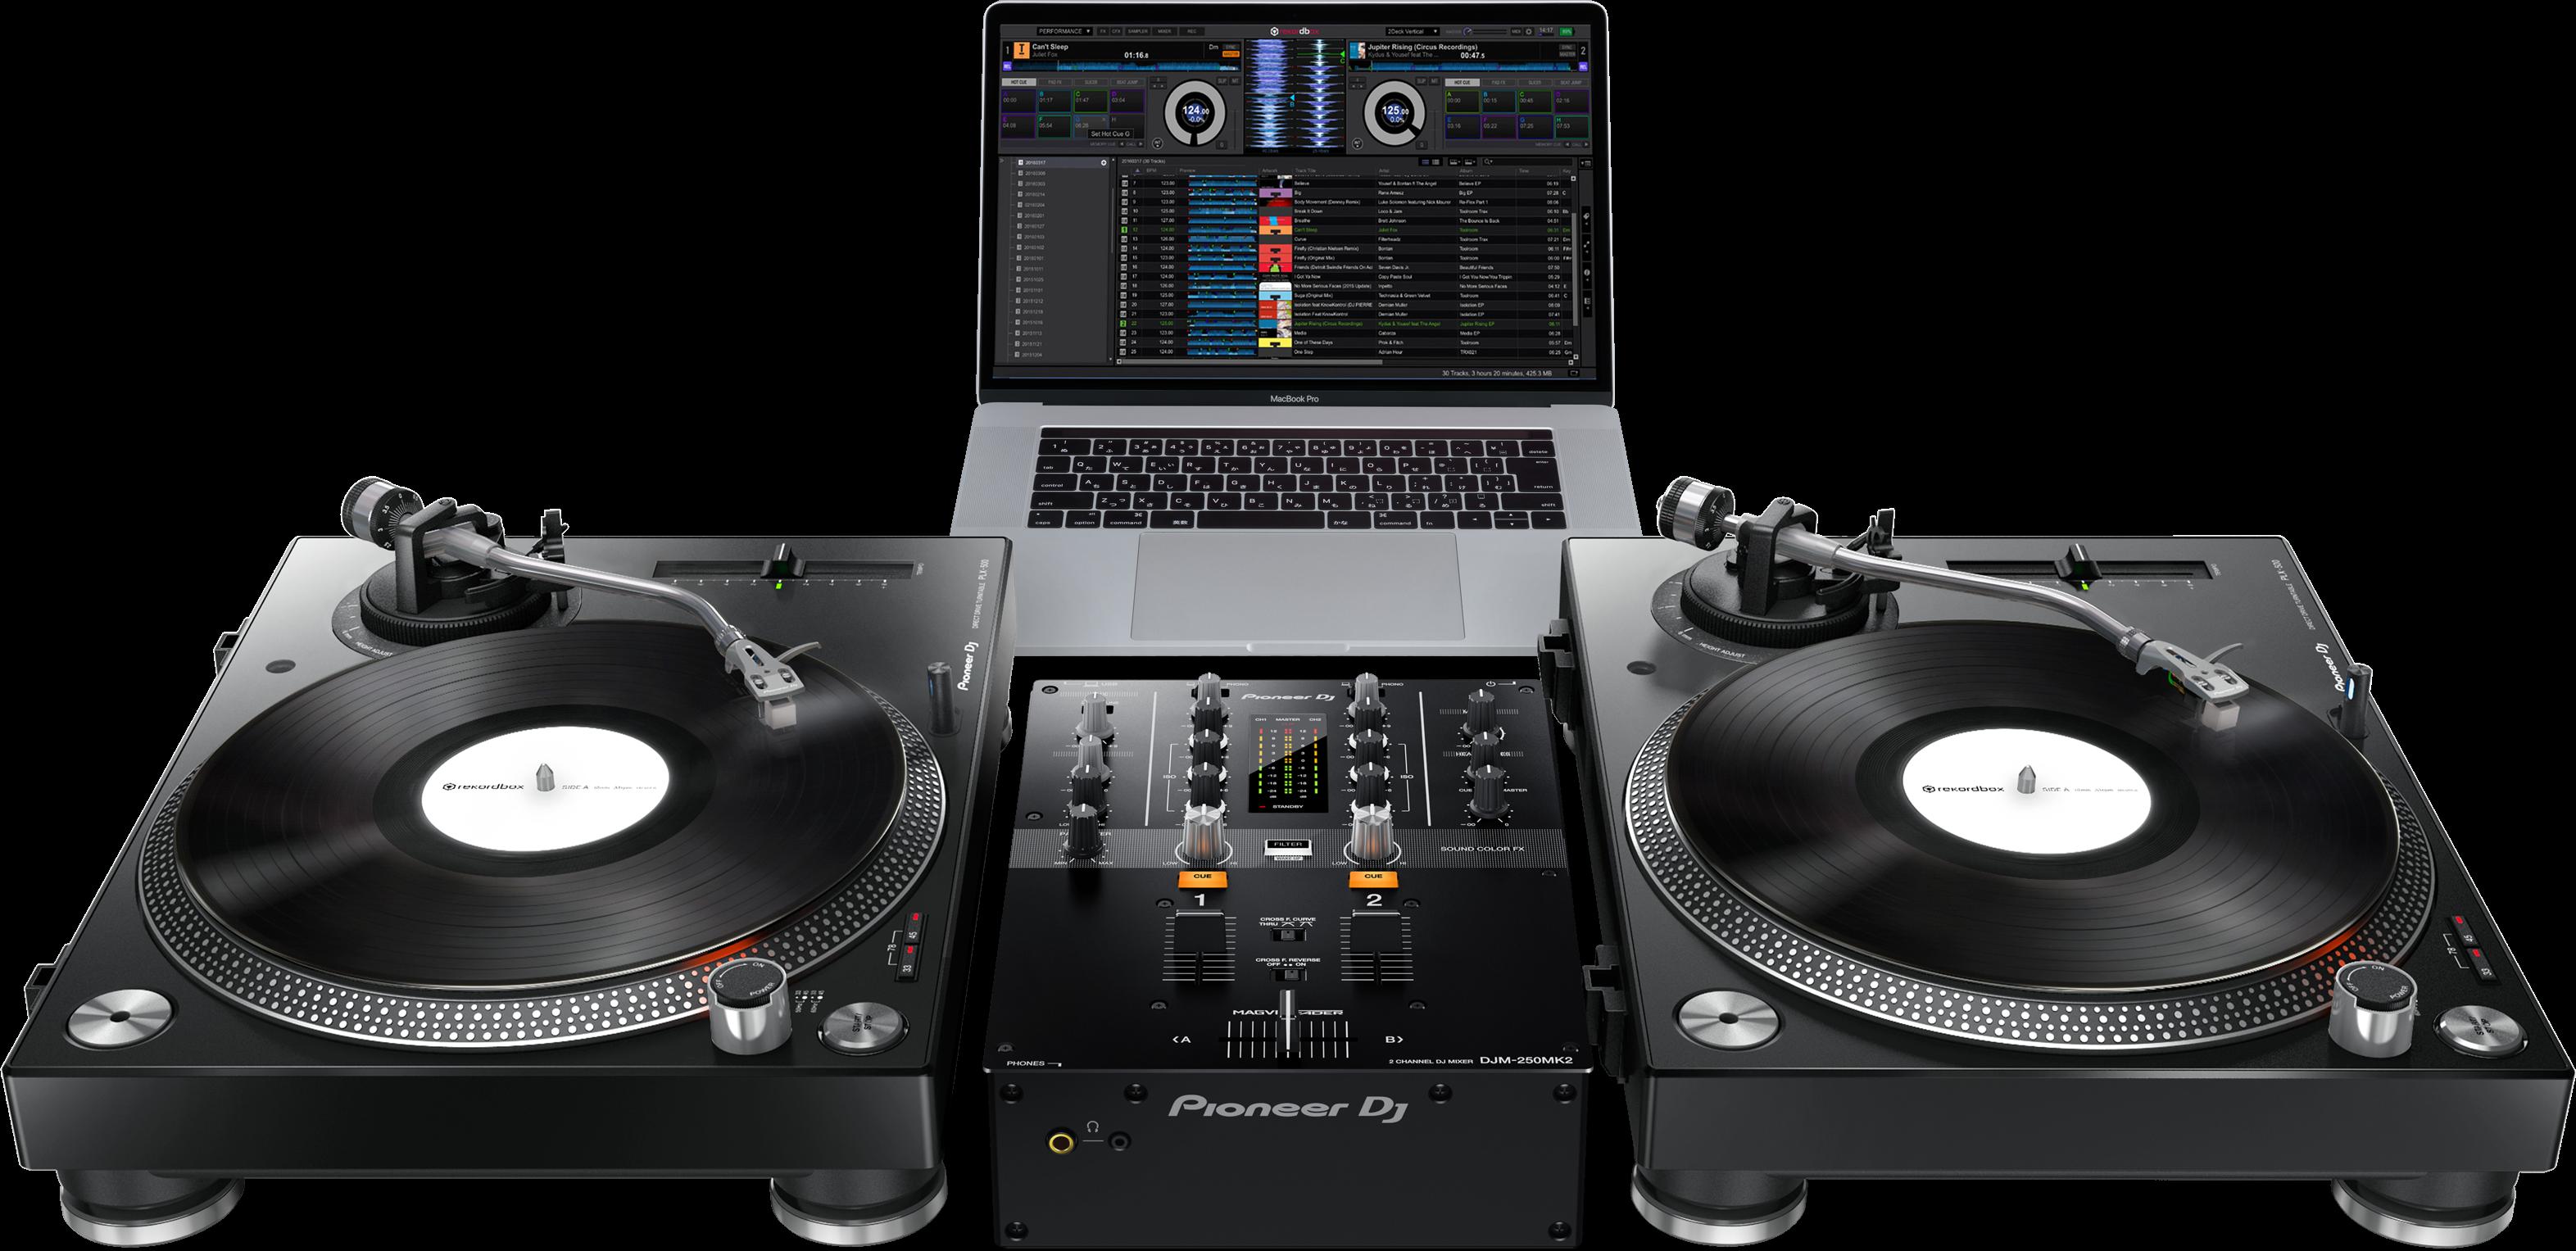 djm-250mk2-dvs-set-new